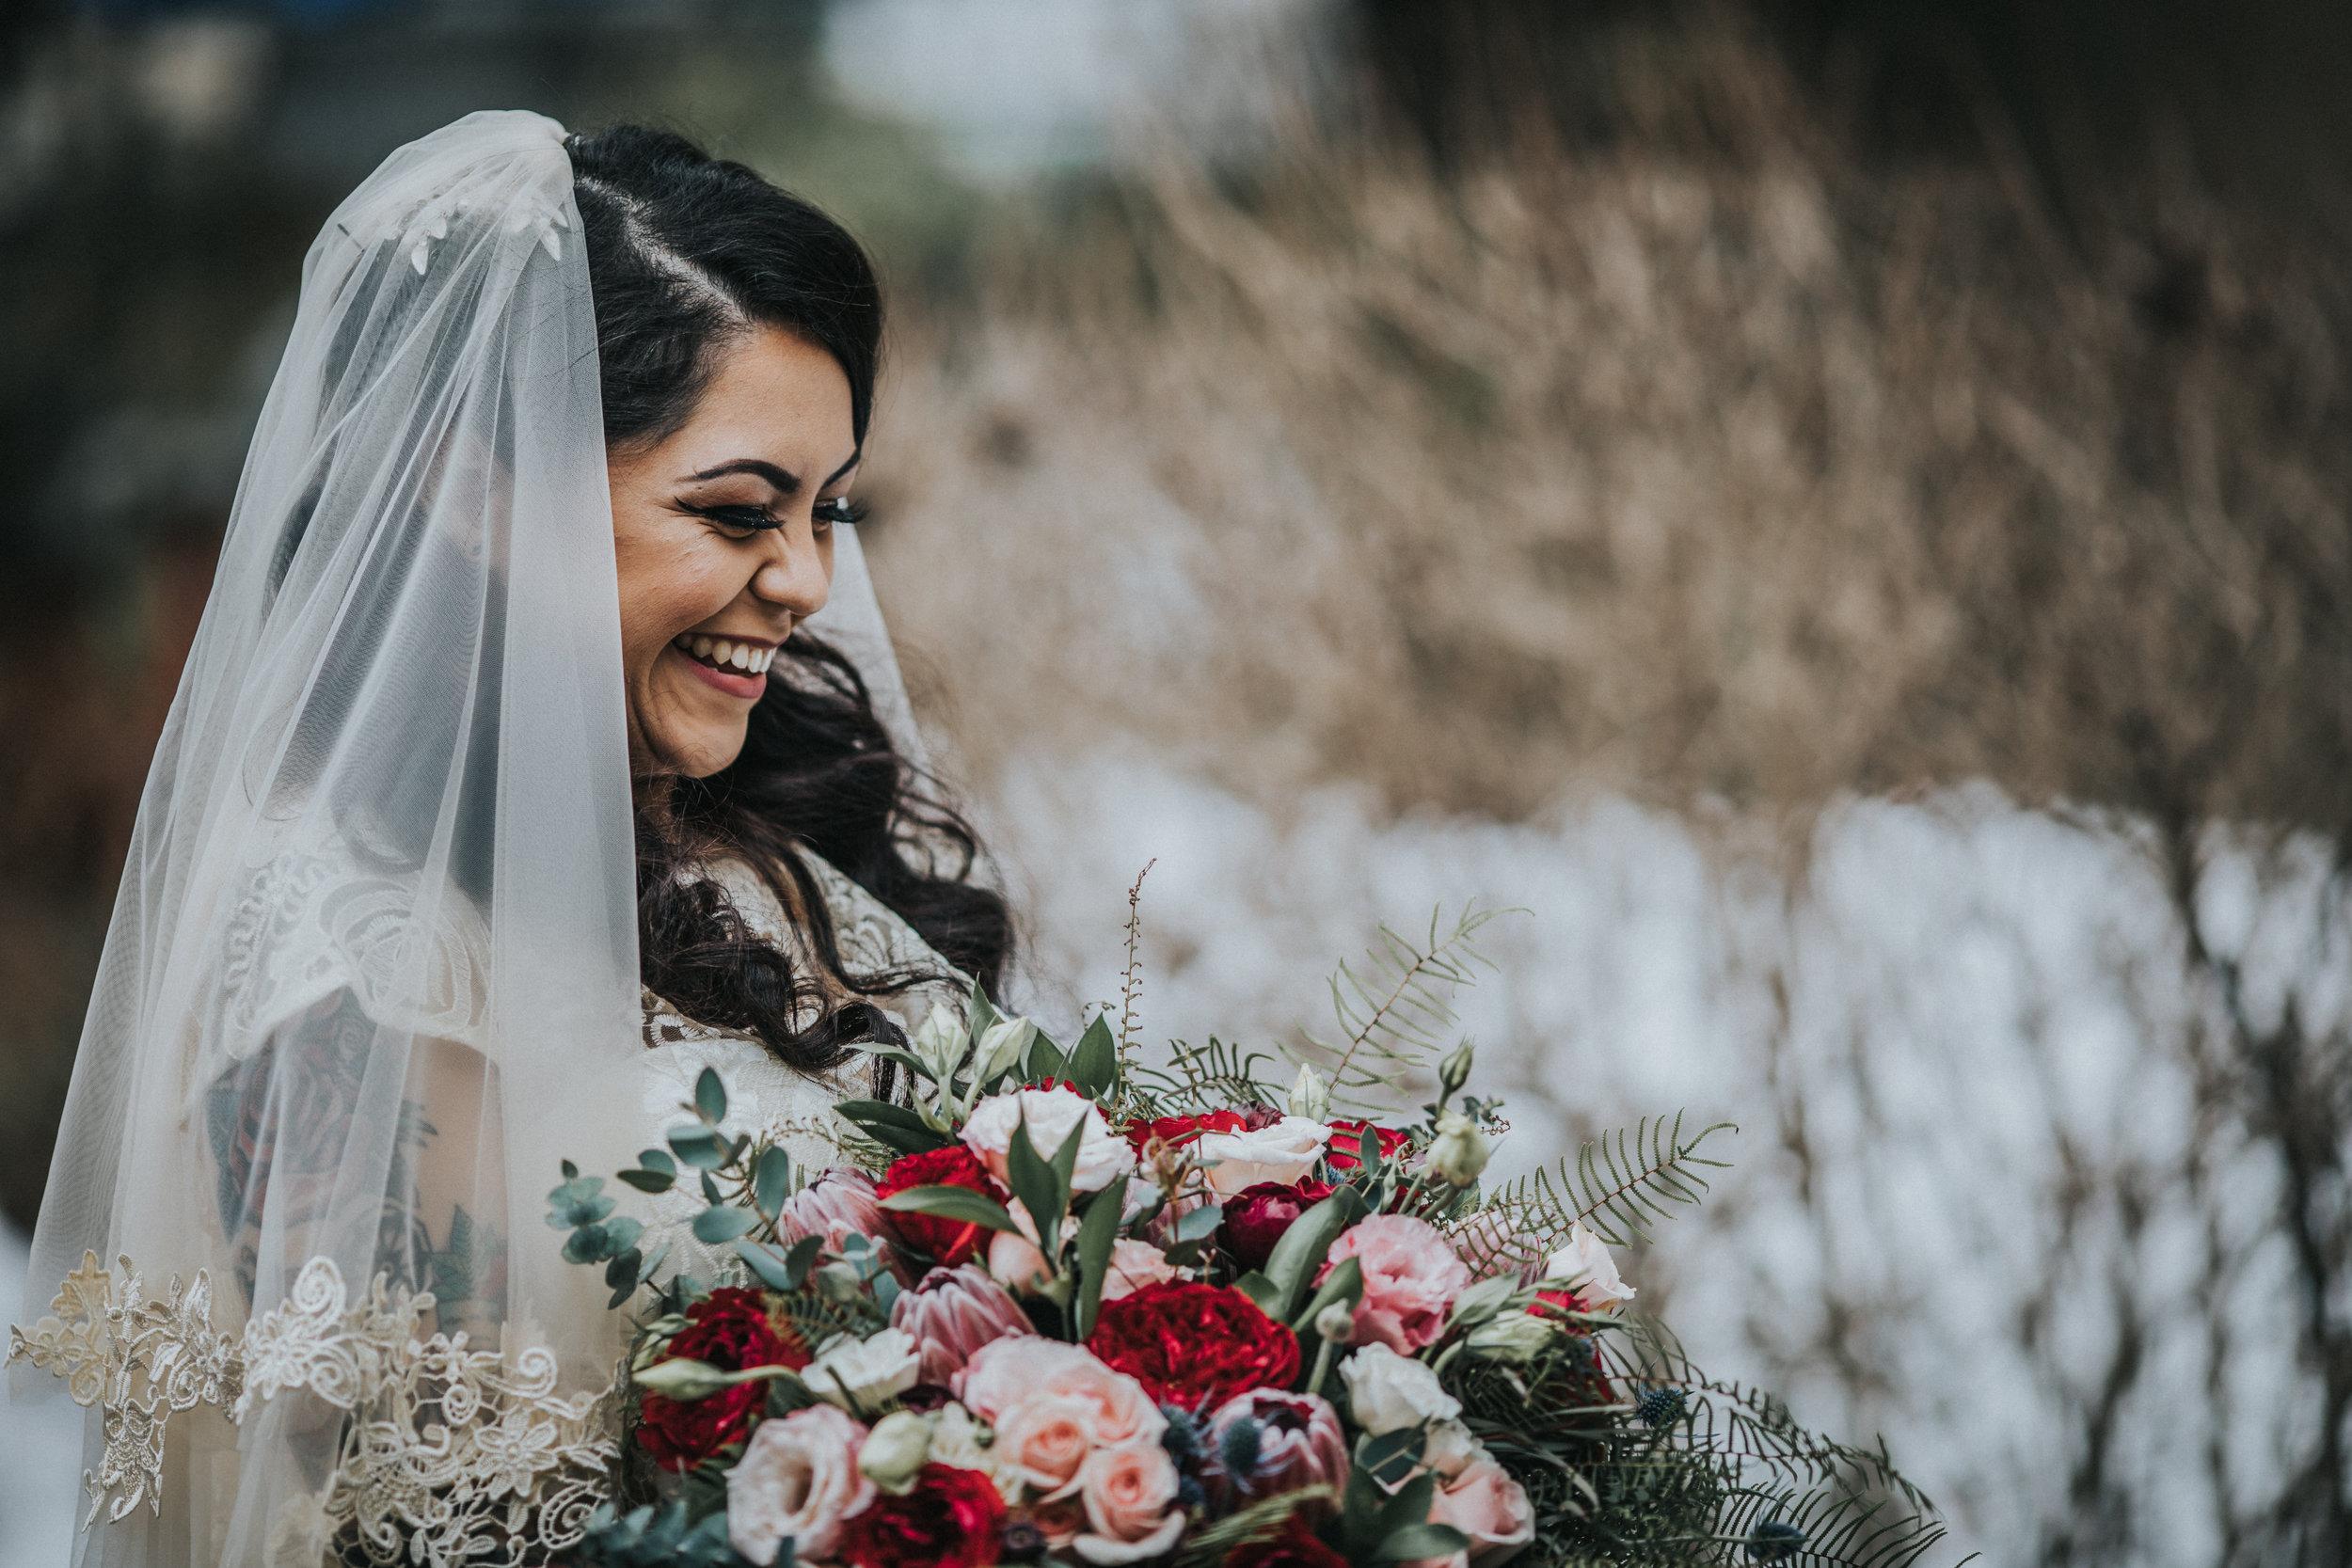 New-Jersey-Wedding-Photographer-ReceptionCenter-Valeria&Mike-First-Look-Bride&Groom (25 of 69).jpg